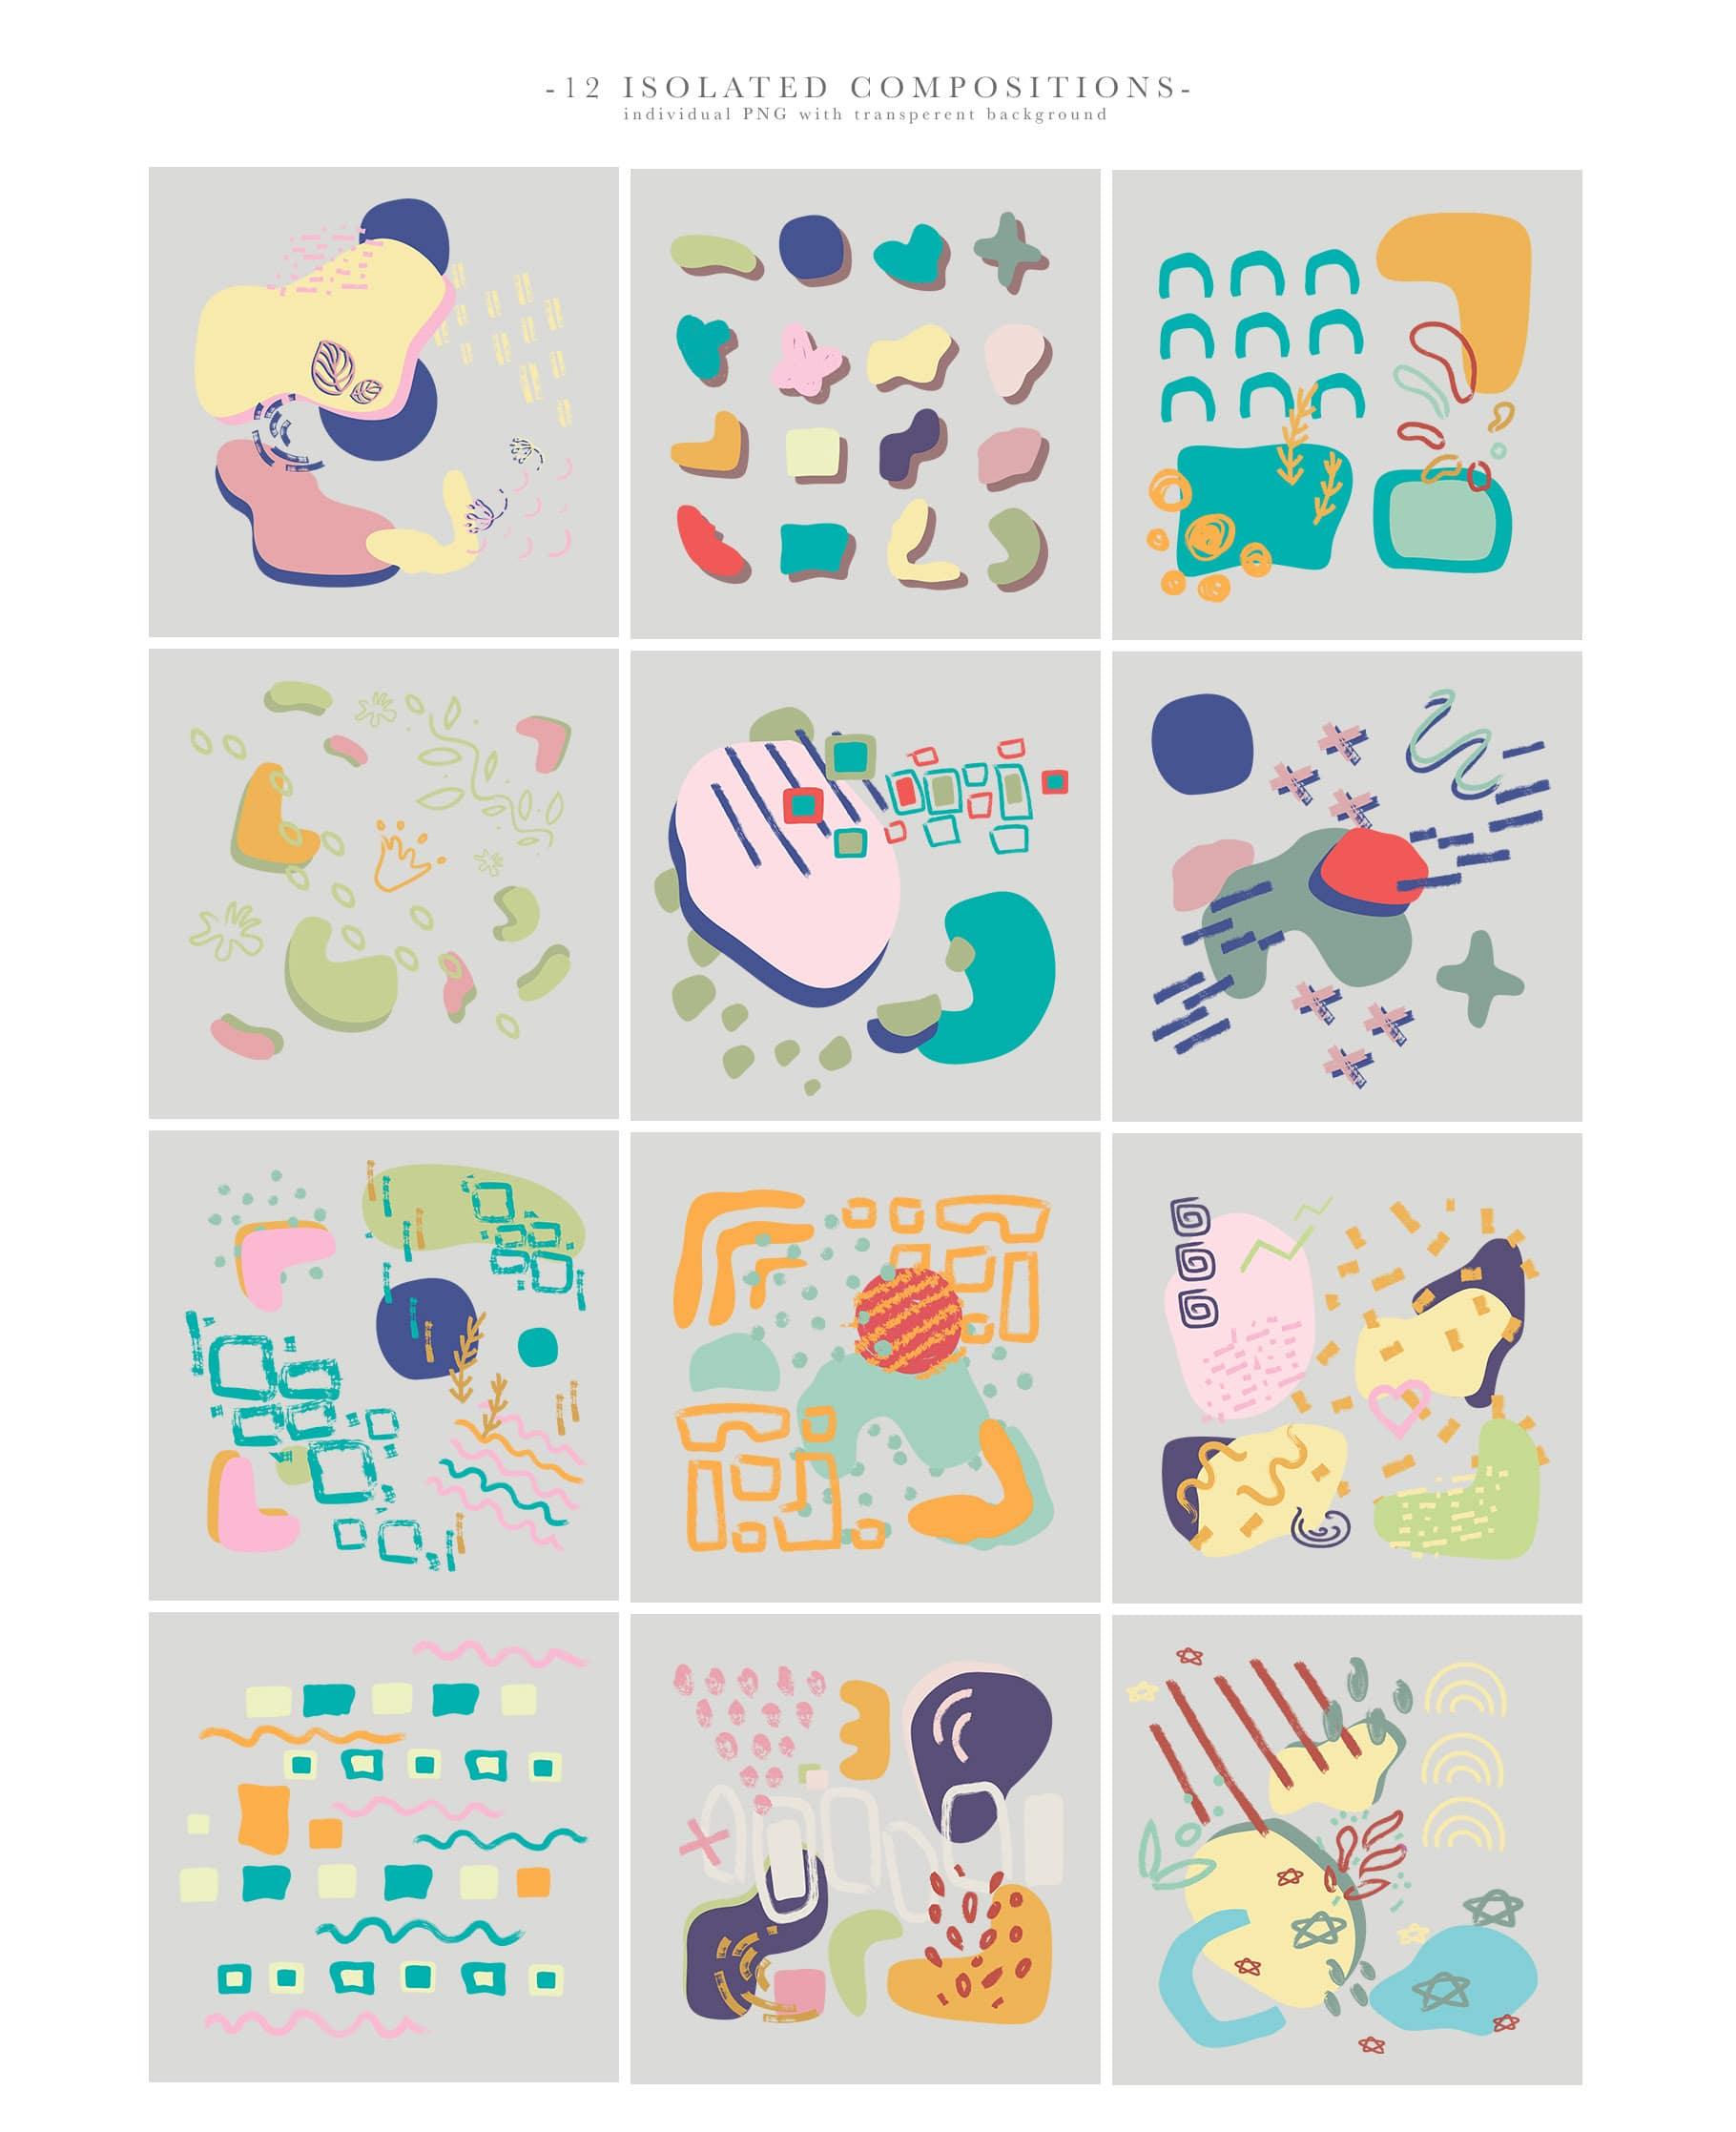 La Liberte Creative Set (Abstract Shapes and Elements) - $15 - Prev7 min